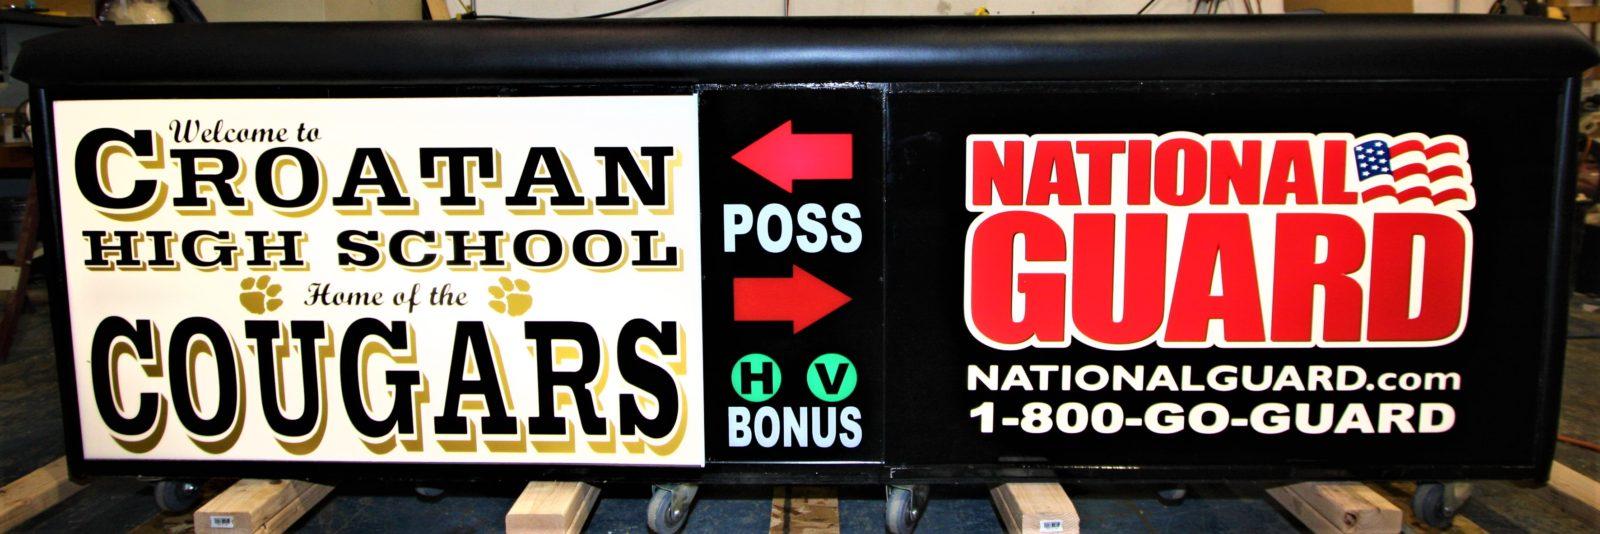 Croation high school scoring table North Carolina Army National Guard NCARNG